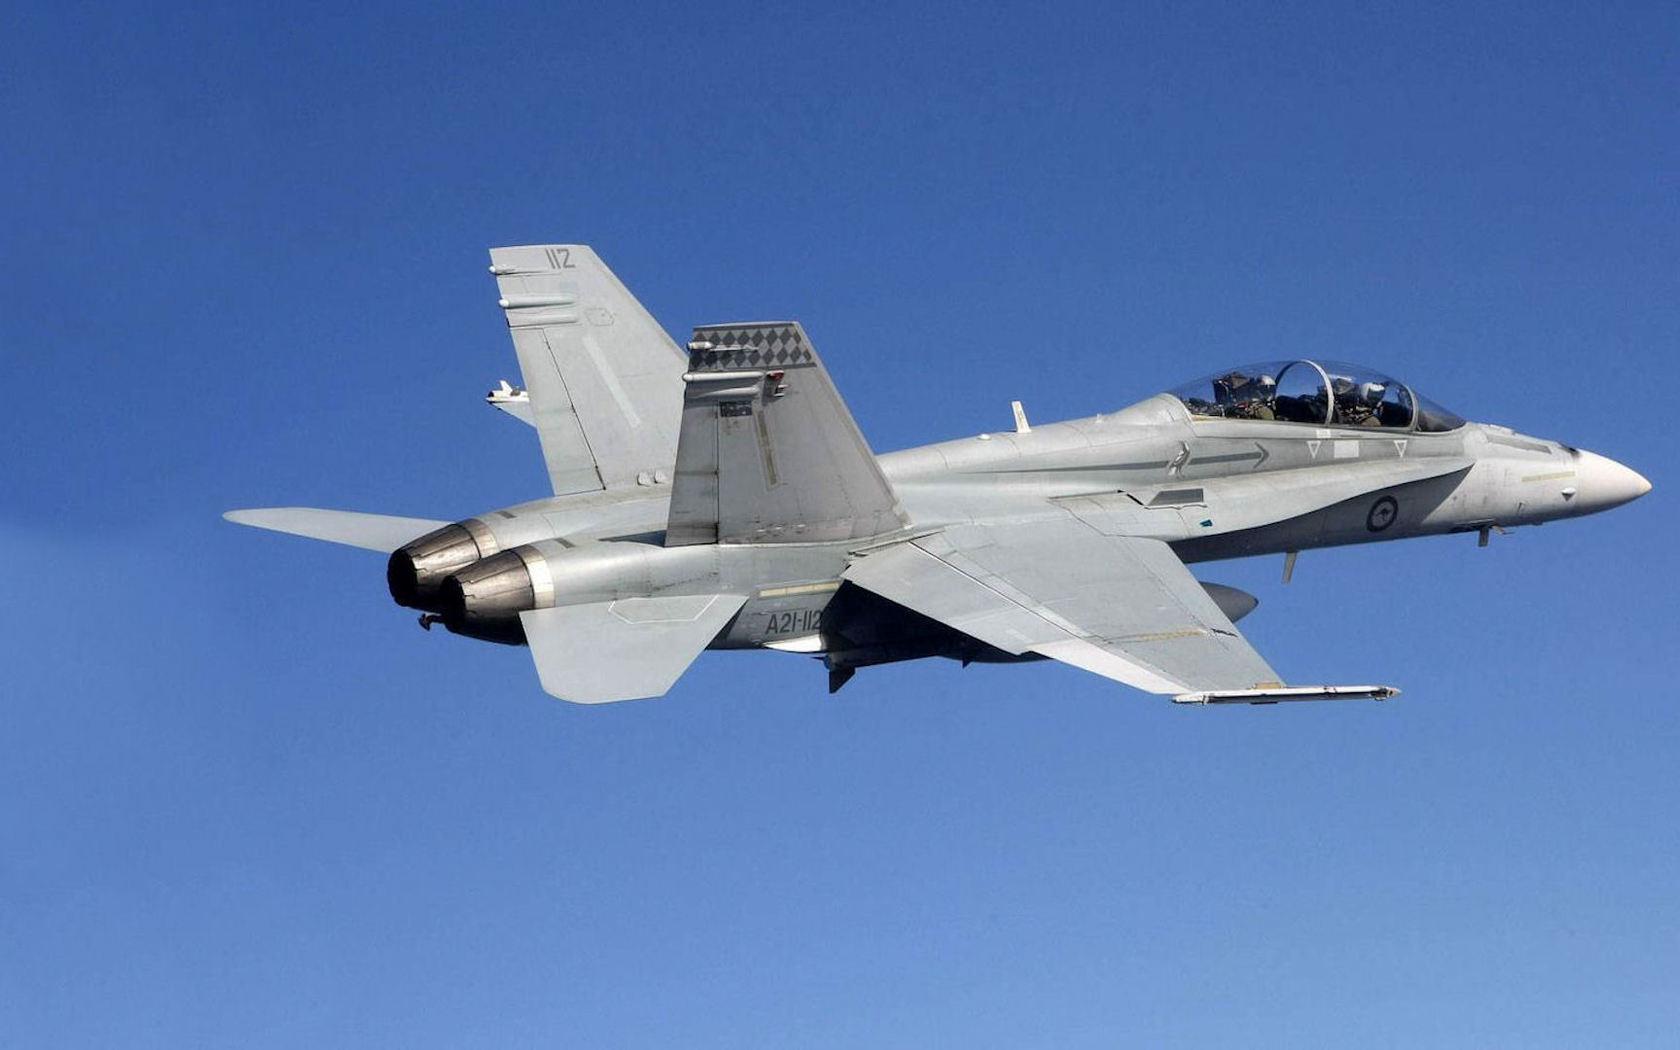 fa 18 super hornet fighter bomber wallpapers - 1680x1050 - 114902